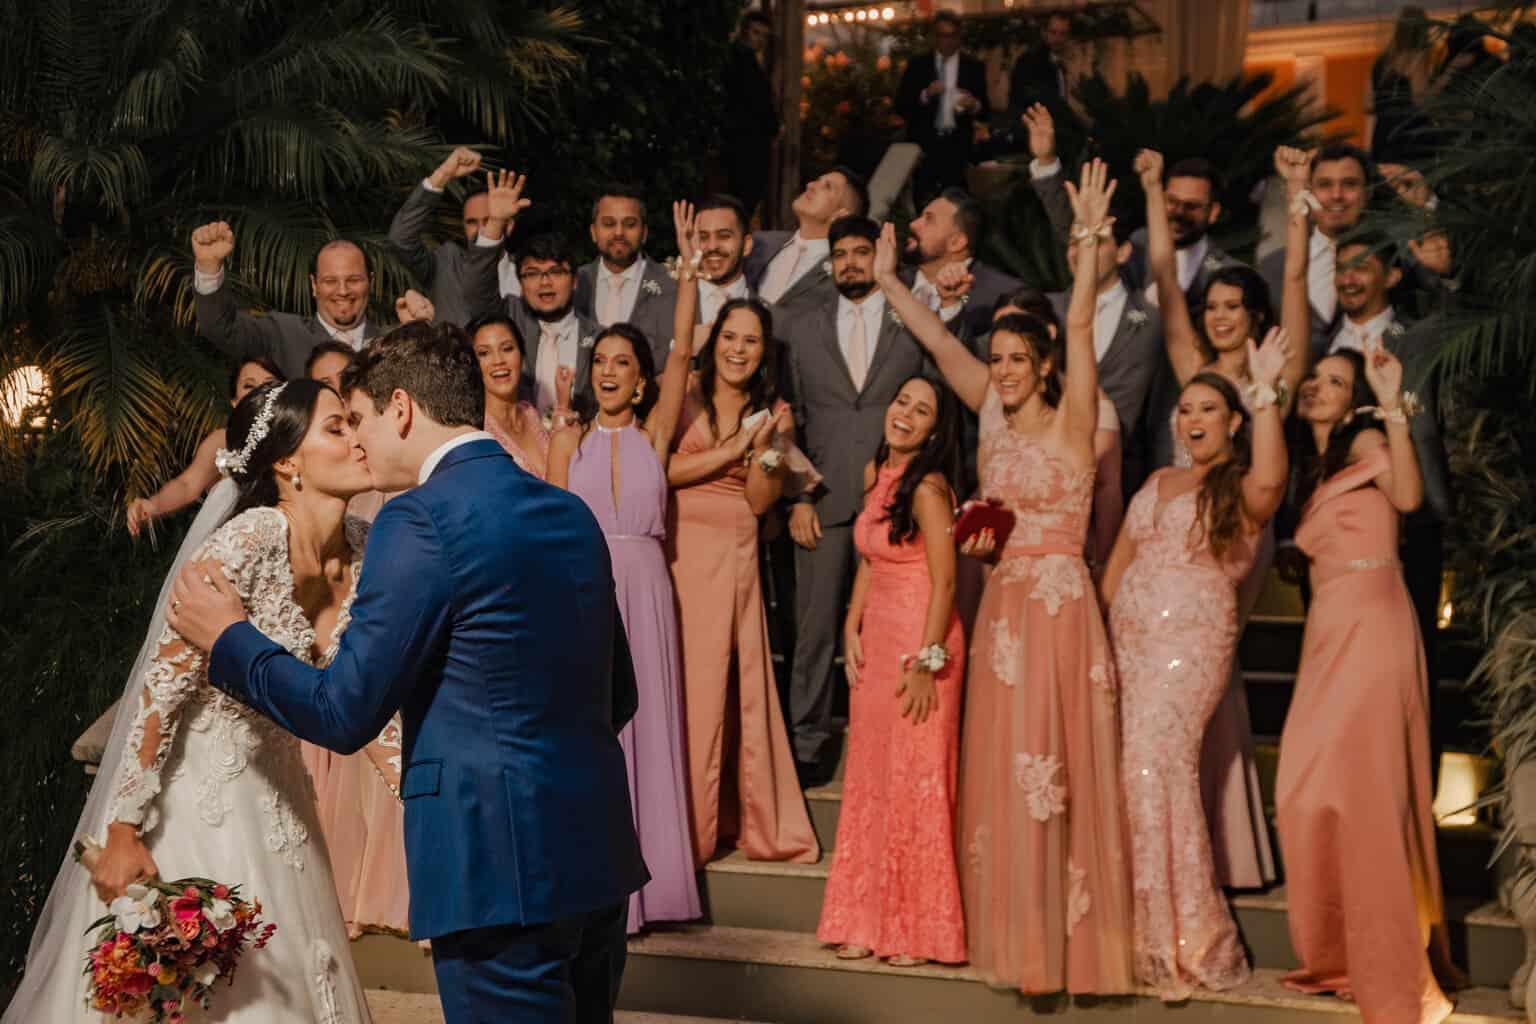 casamento-Beatriz-e-Joao-Fernando-Itaipava-Locanda-Della-Mimosa-padrinhos-Thienny-Tammis185